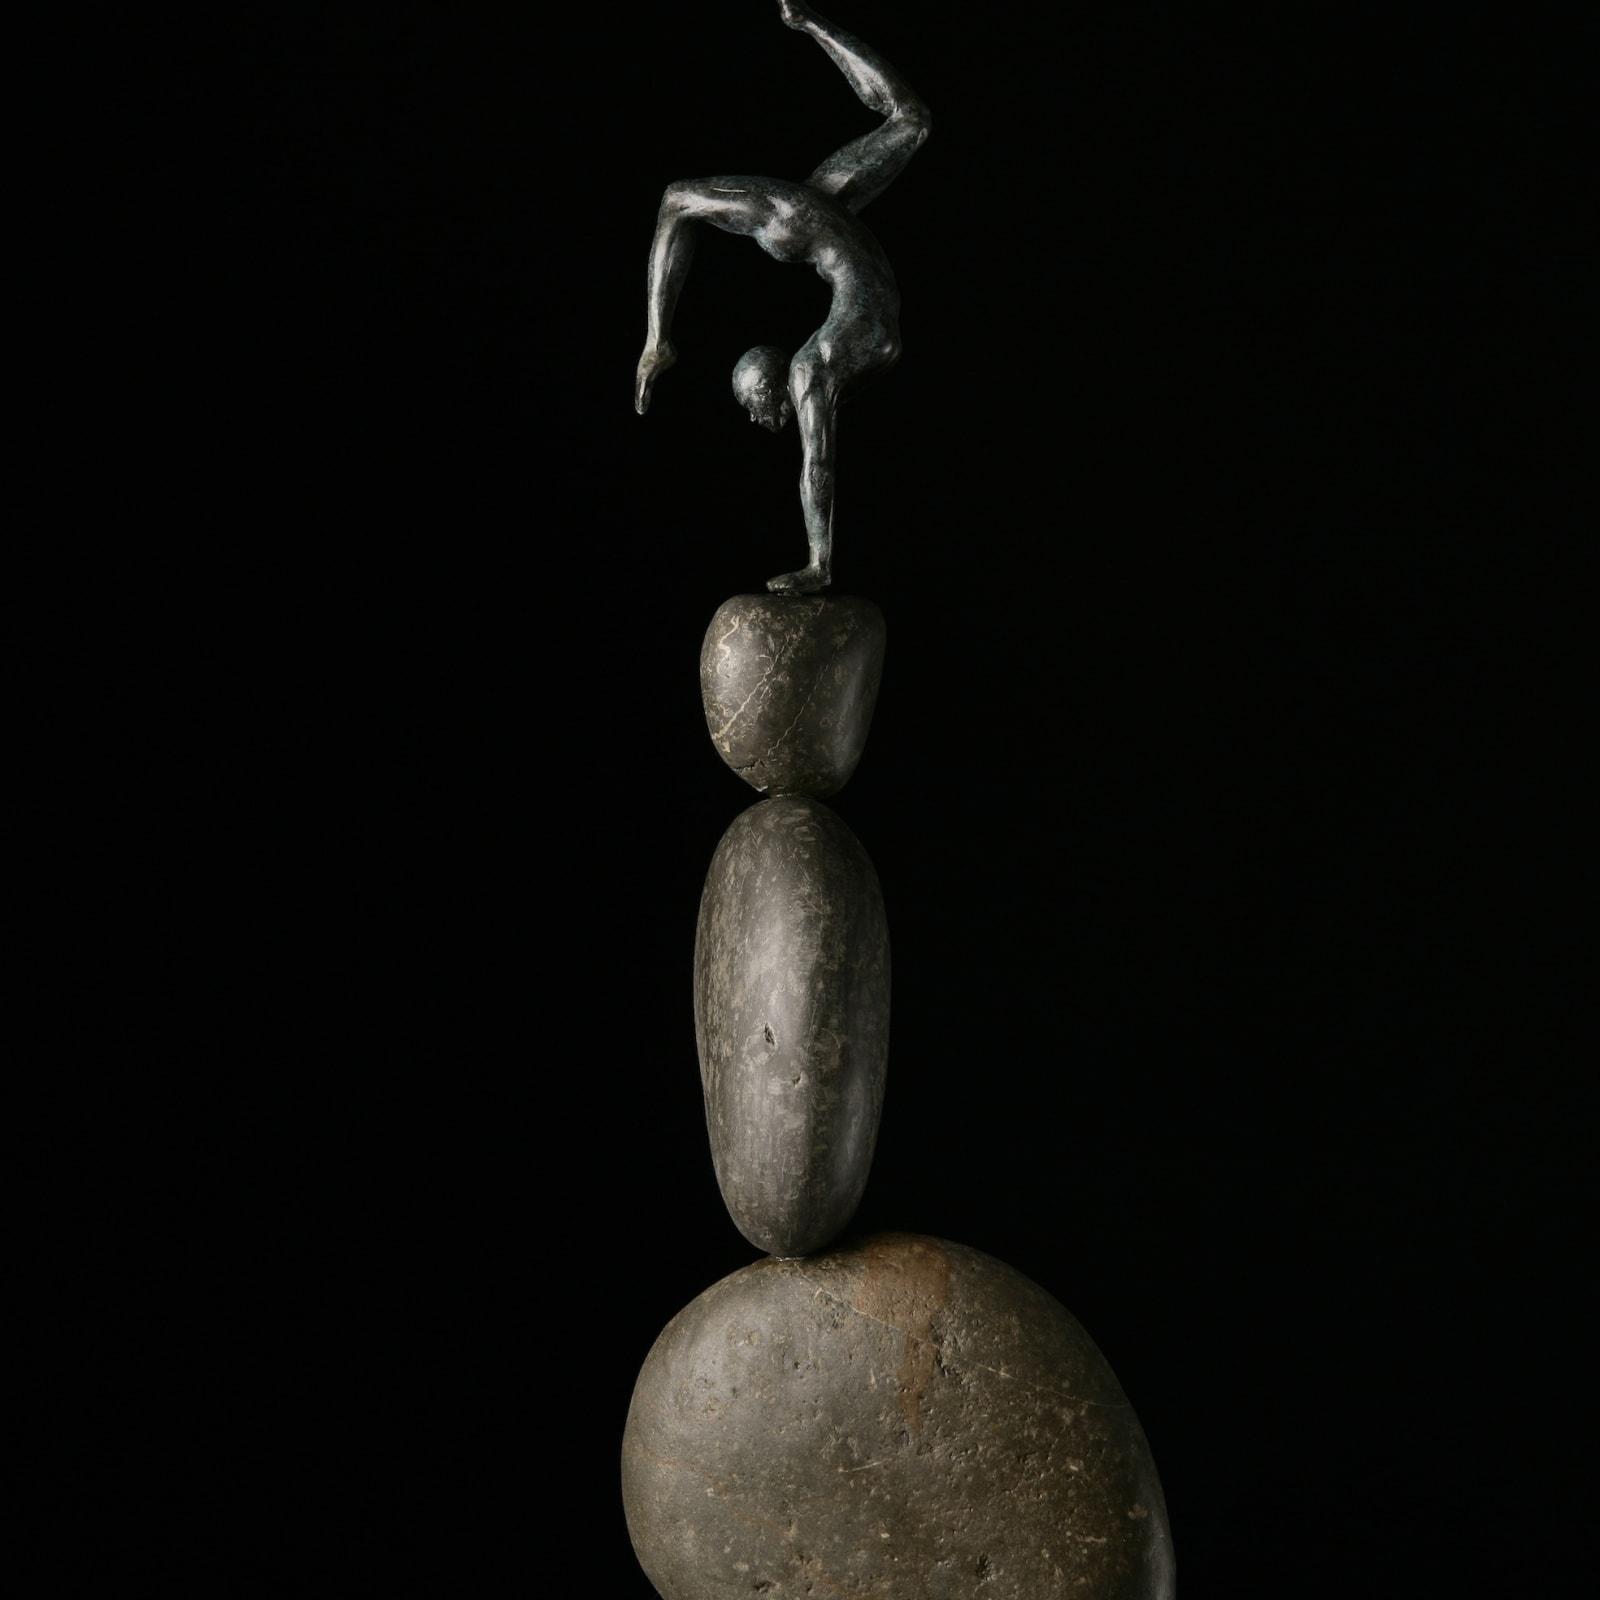 Brendon Murless, Balance, 2019